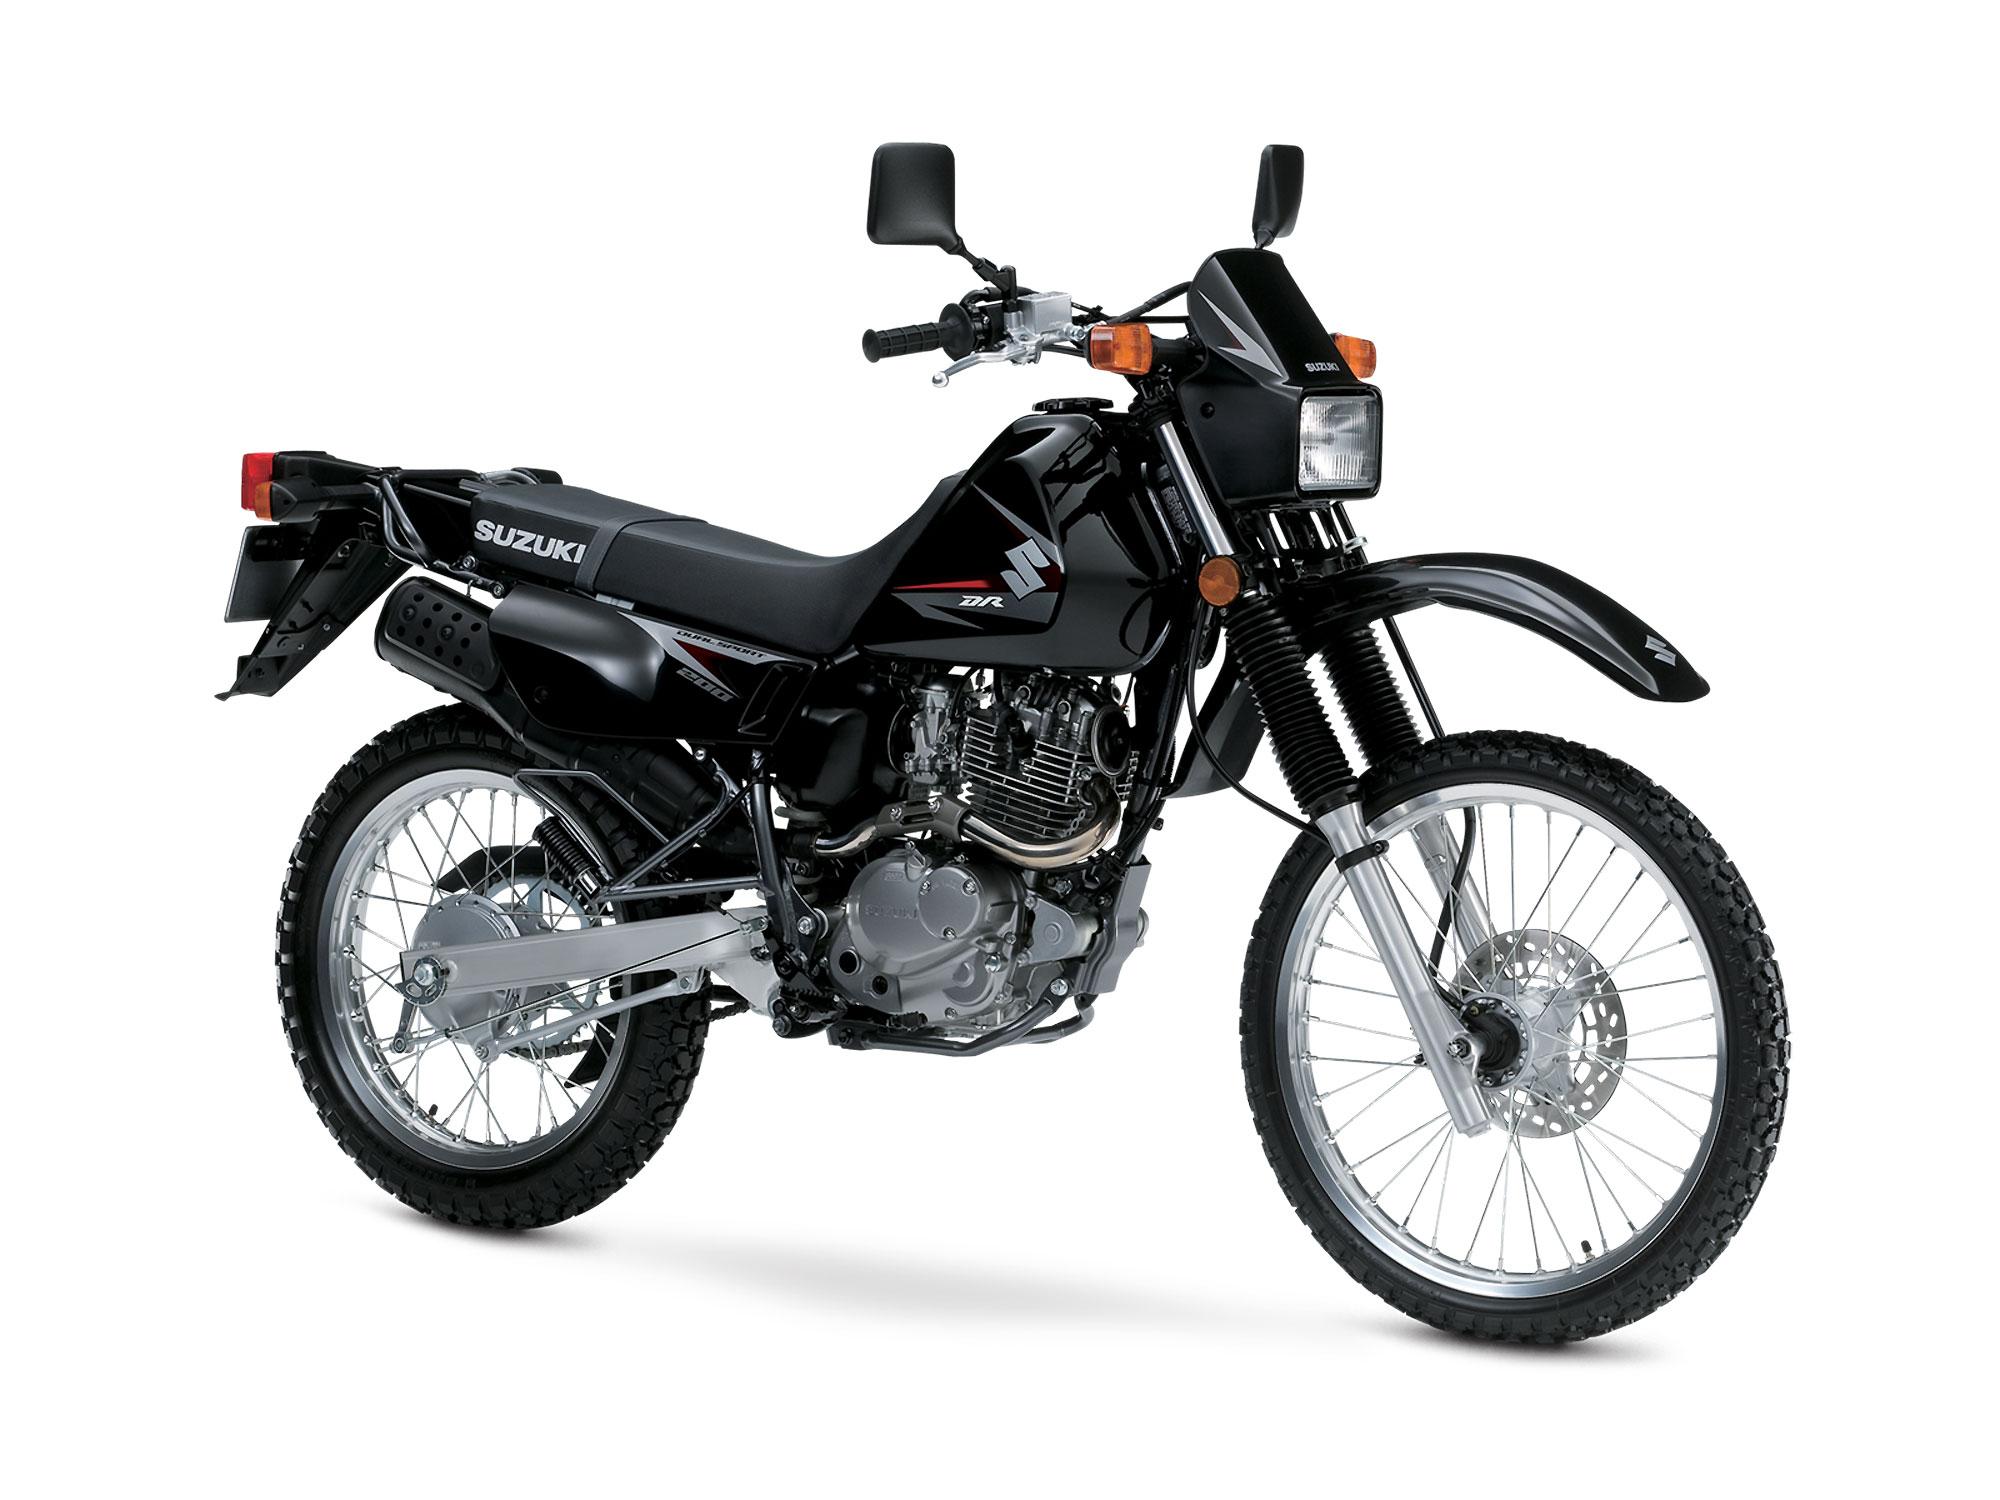 Mesin 150 CC Satria F Buat Calon Trail Suzuki Mantap Kayaknya